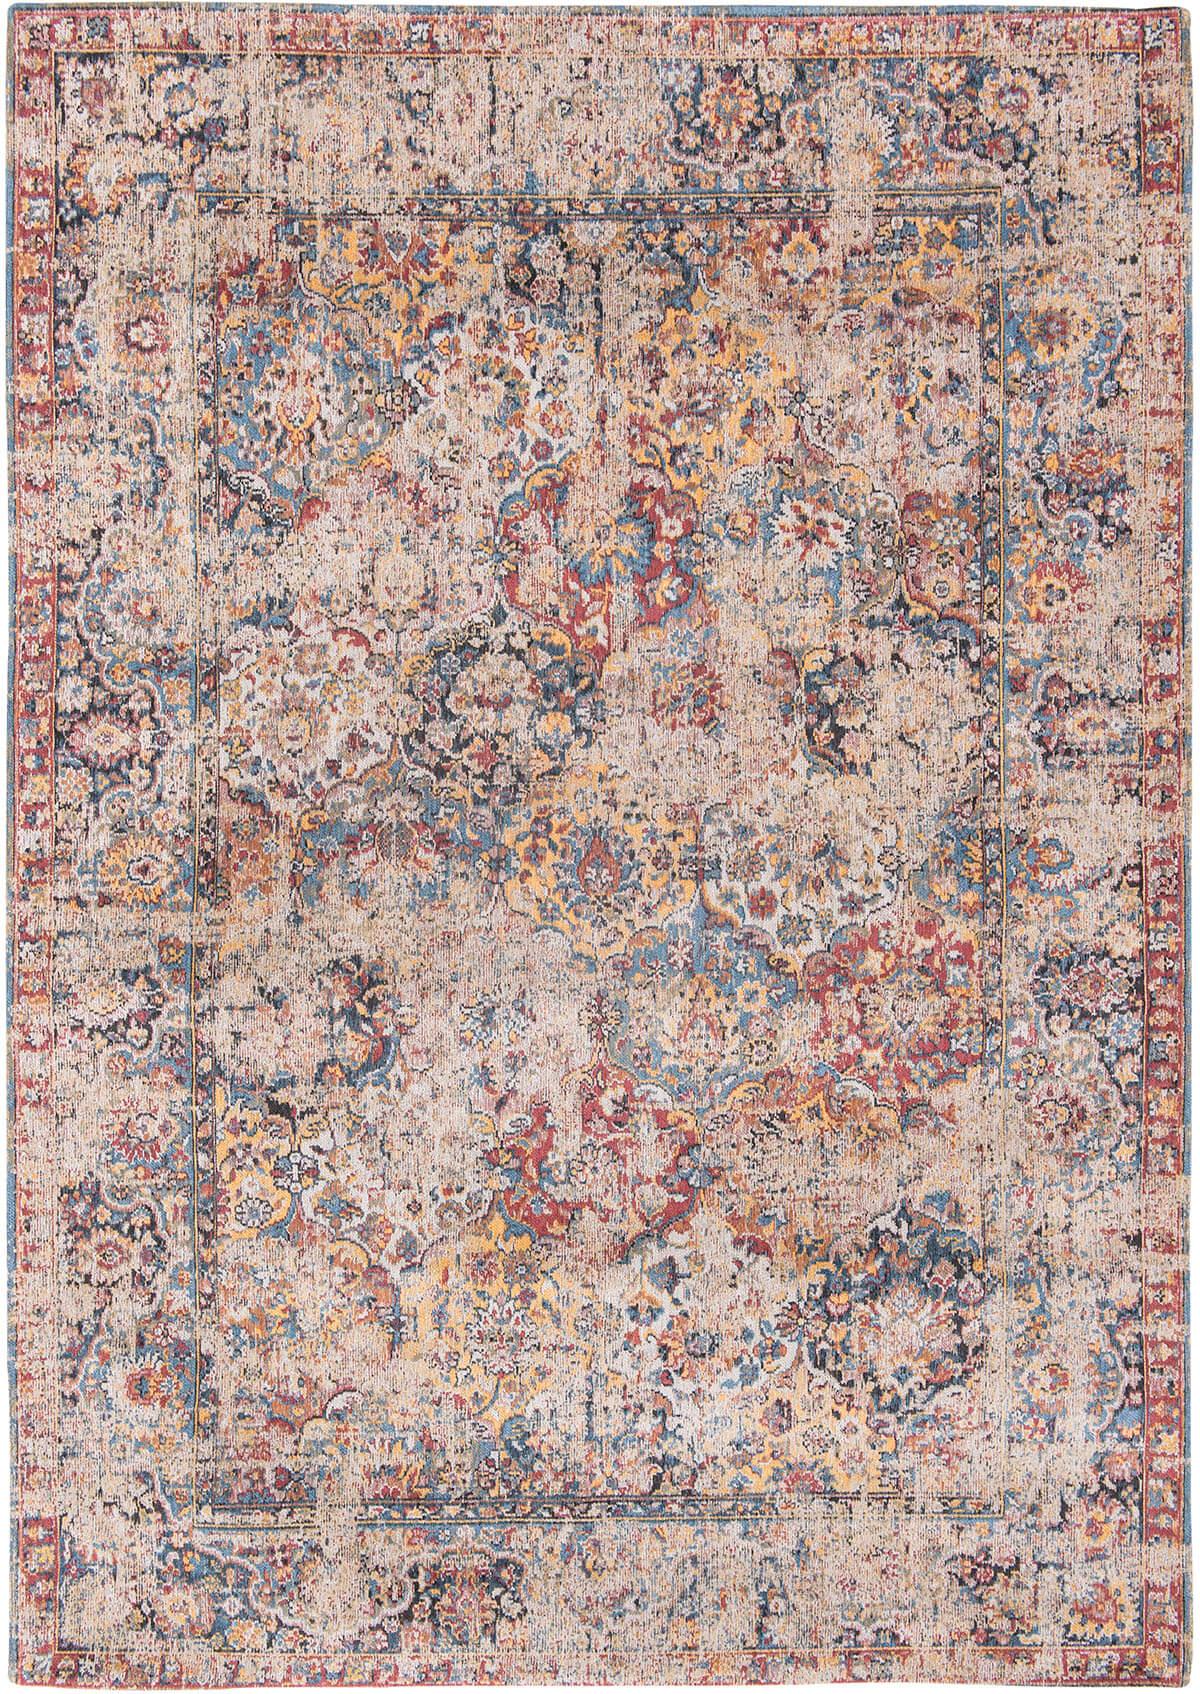 Dywan przetarty (kolorowy) - Khedive 8713